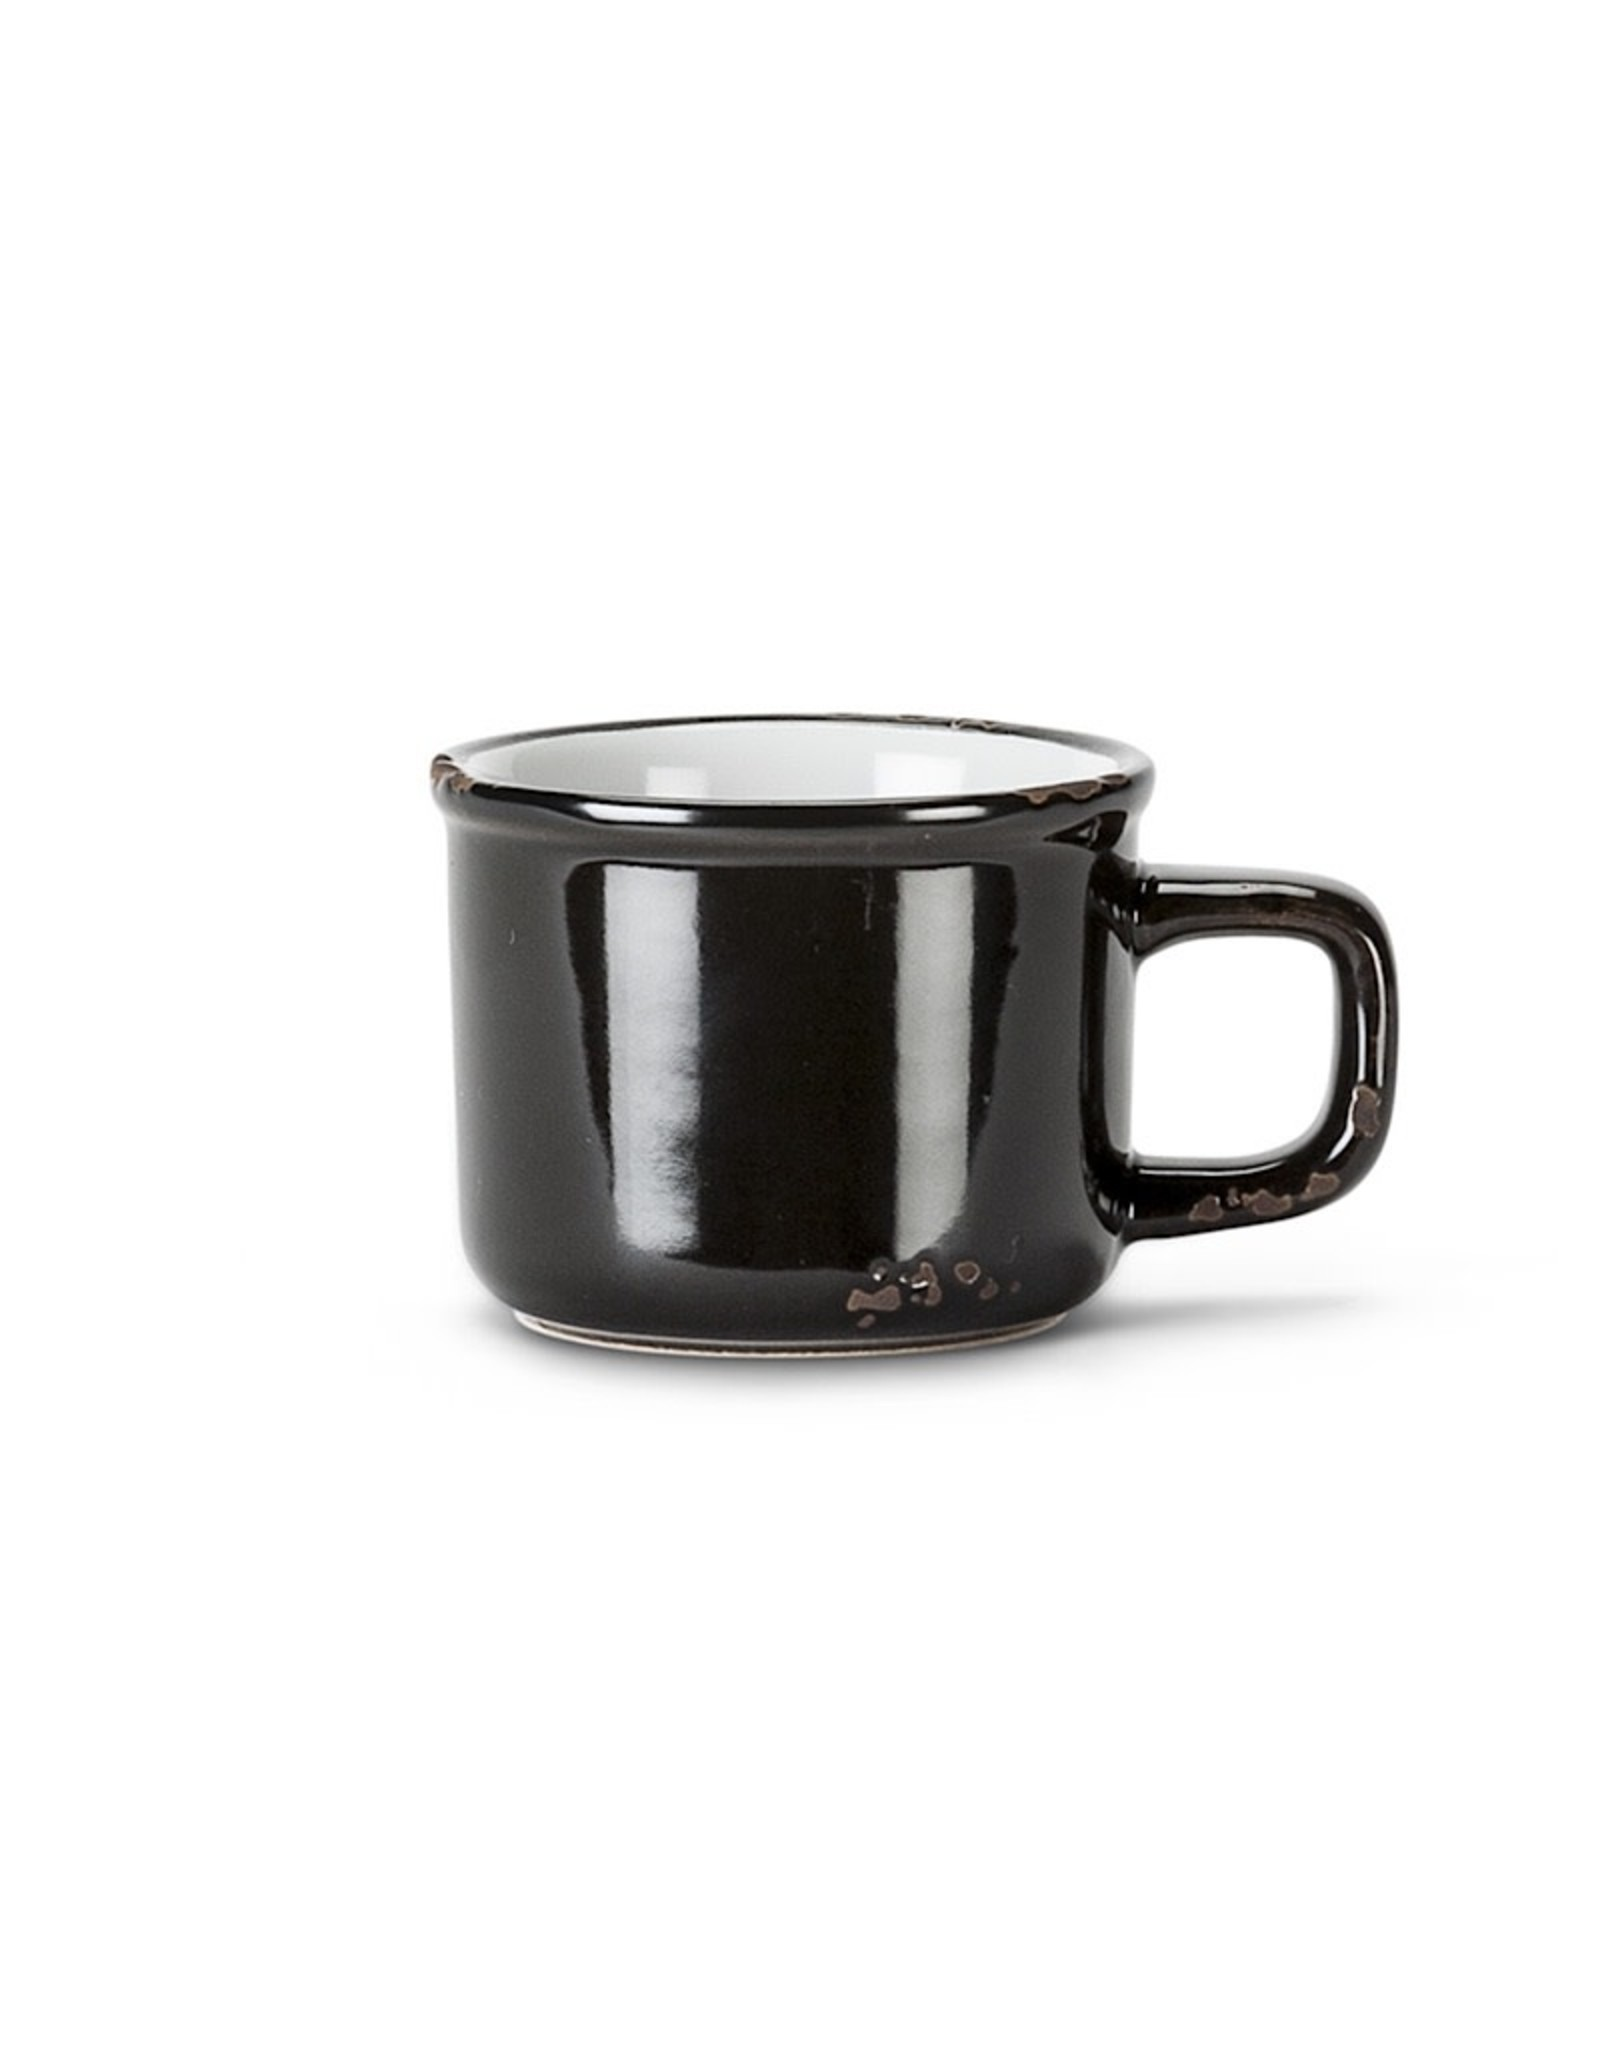 Enamel Mug Espresso